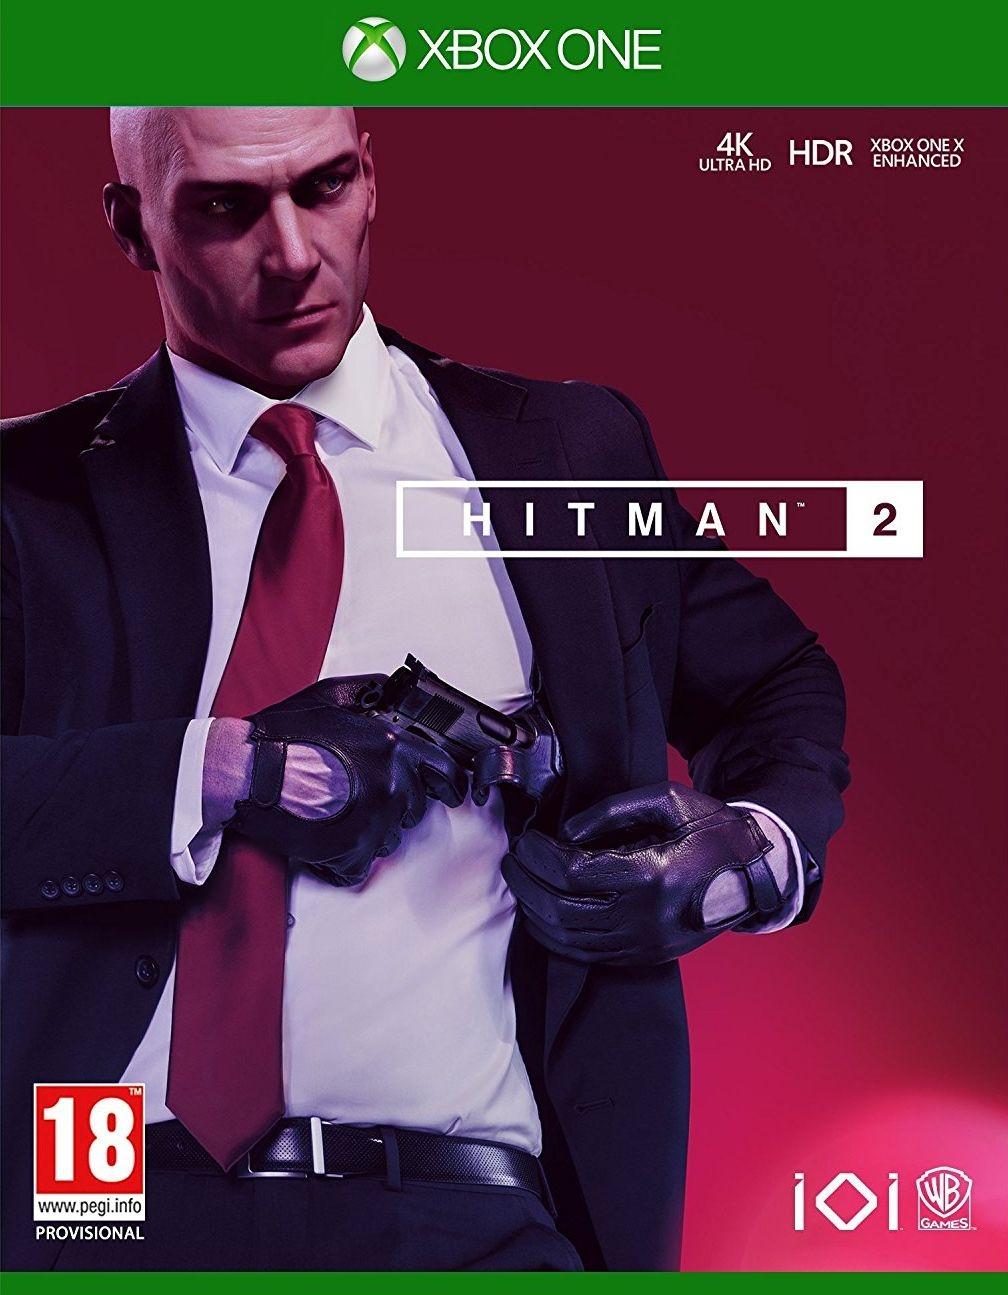 XBOXOne Hitman 2